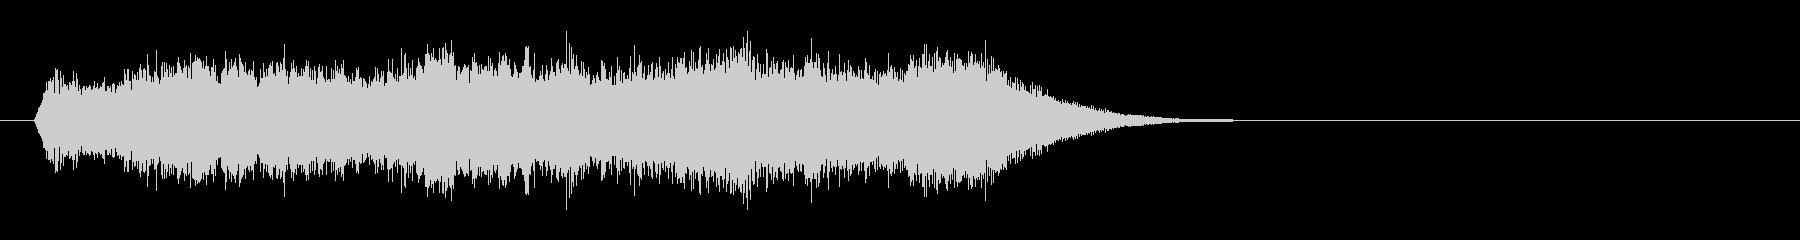 Jingle (SE)'s unreproduced waveform